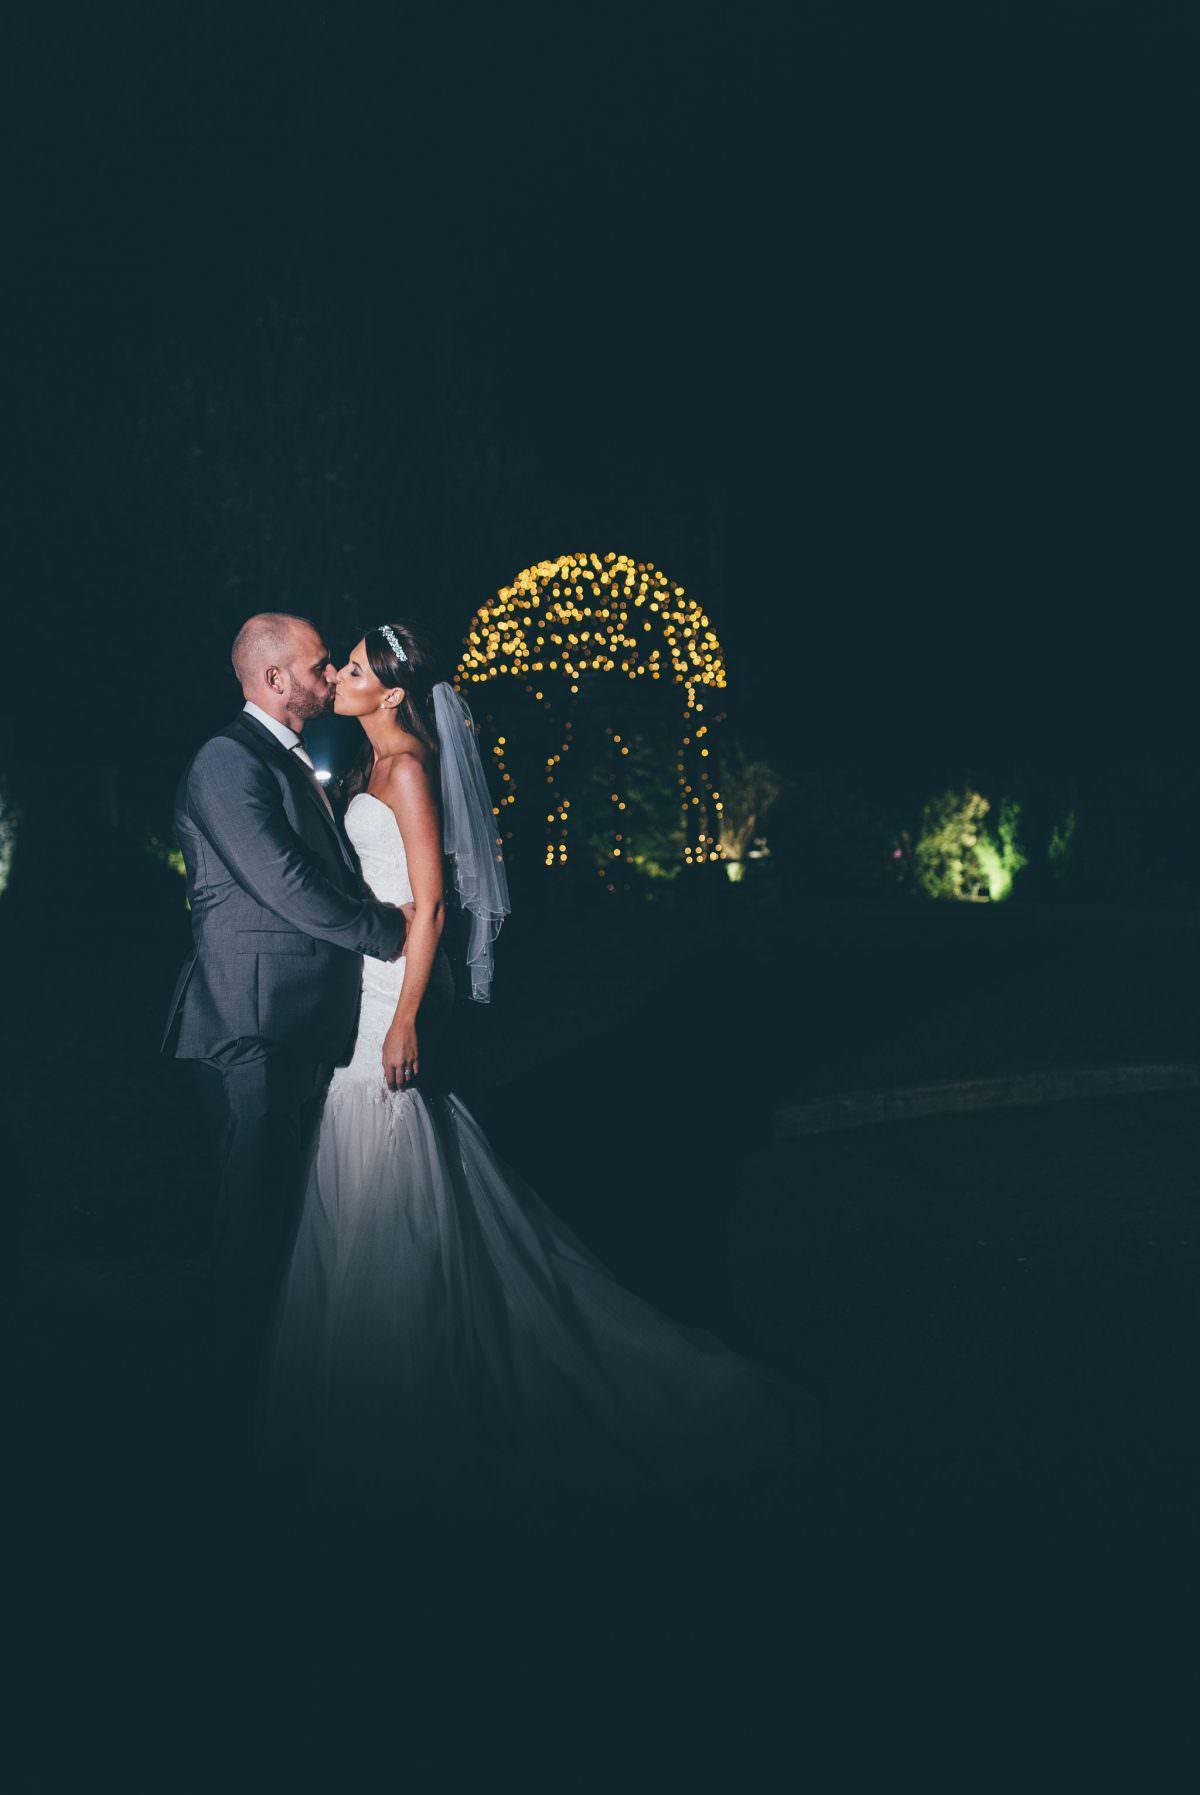 welsh_wedding_photographer_rachel_lambert_photography_decourceys_cardiff_rhiannon_gavin_ 81